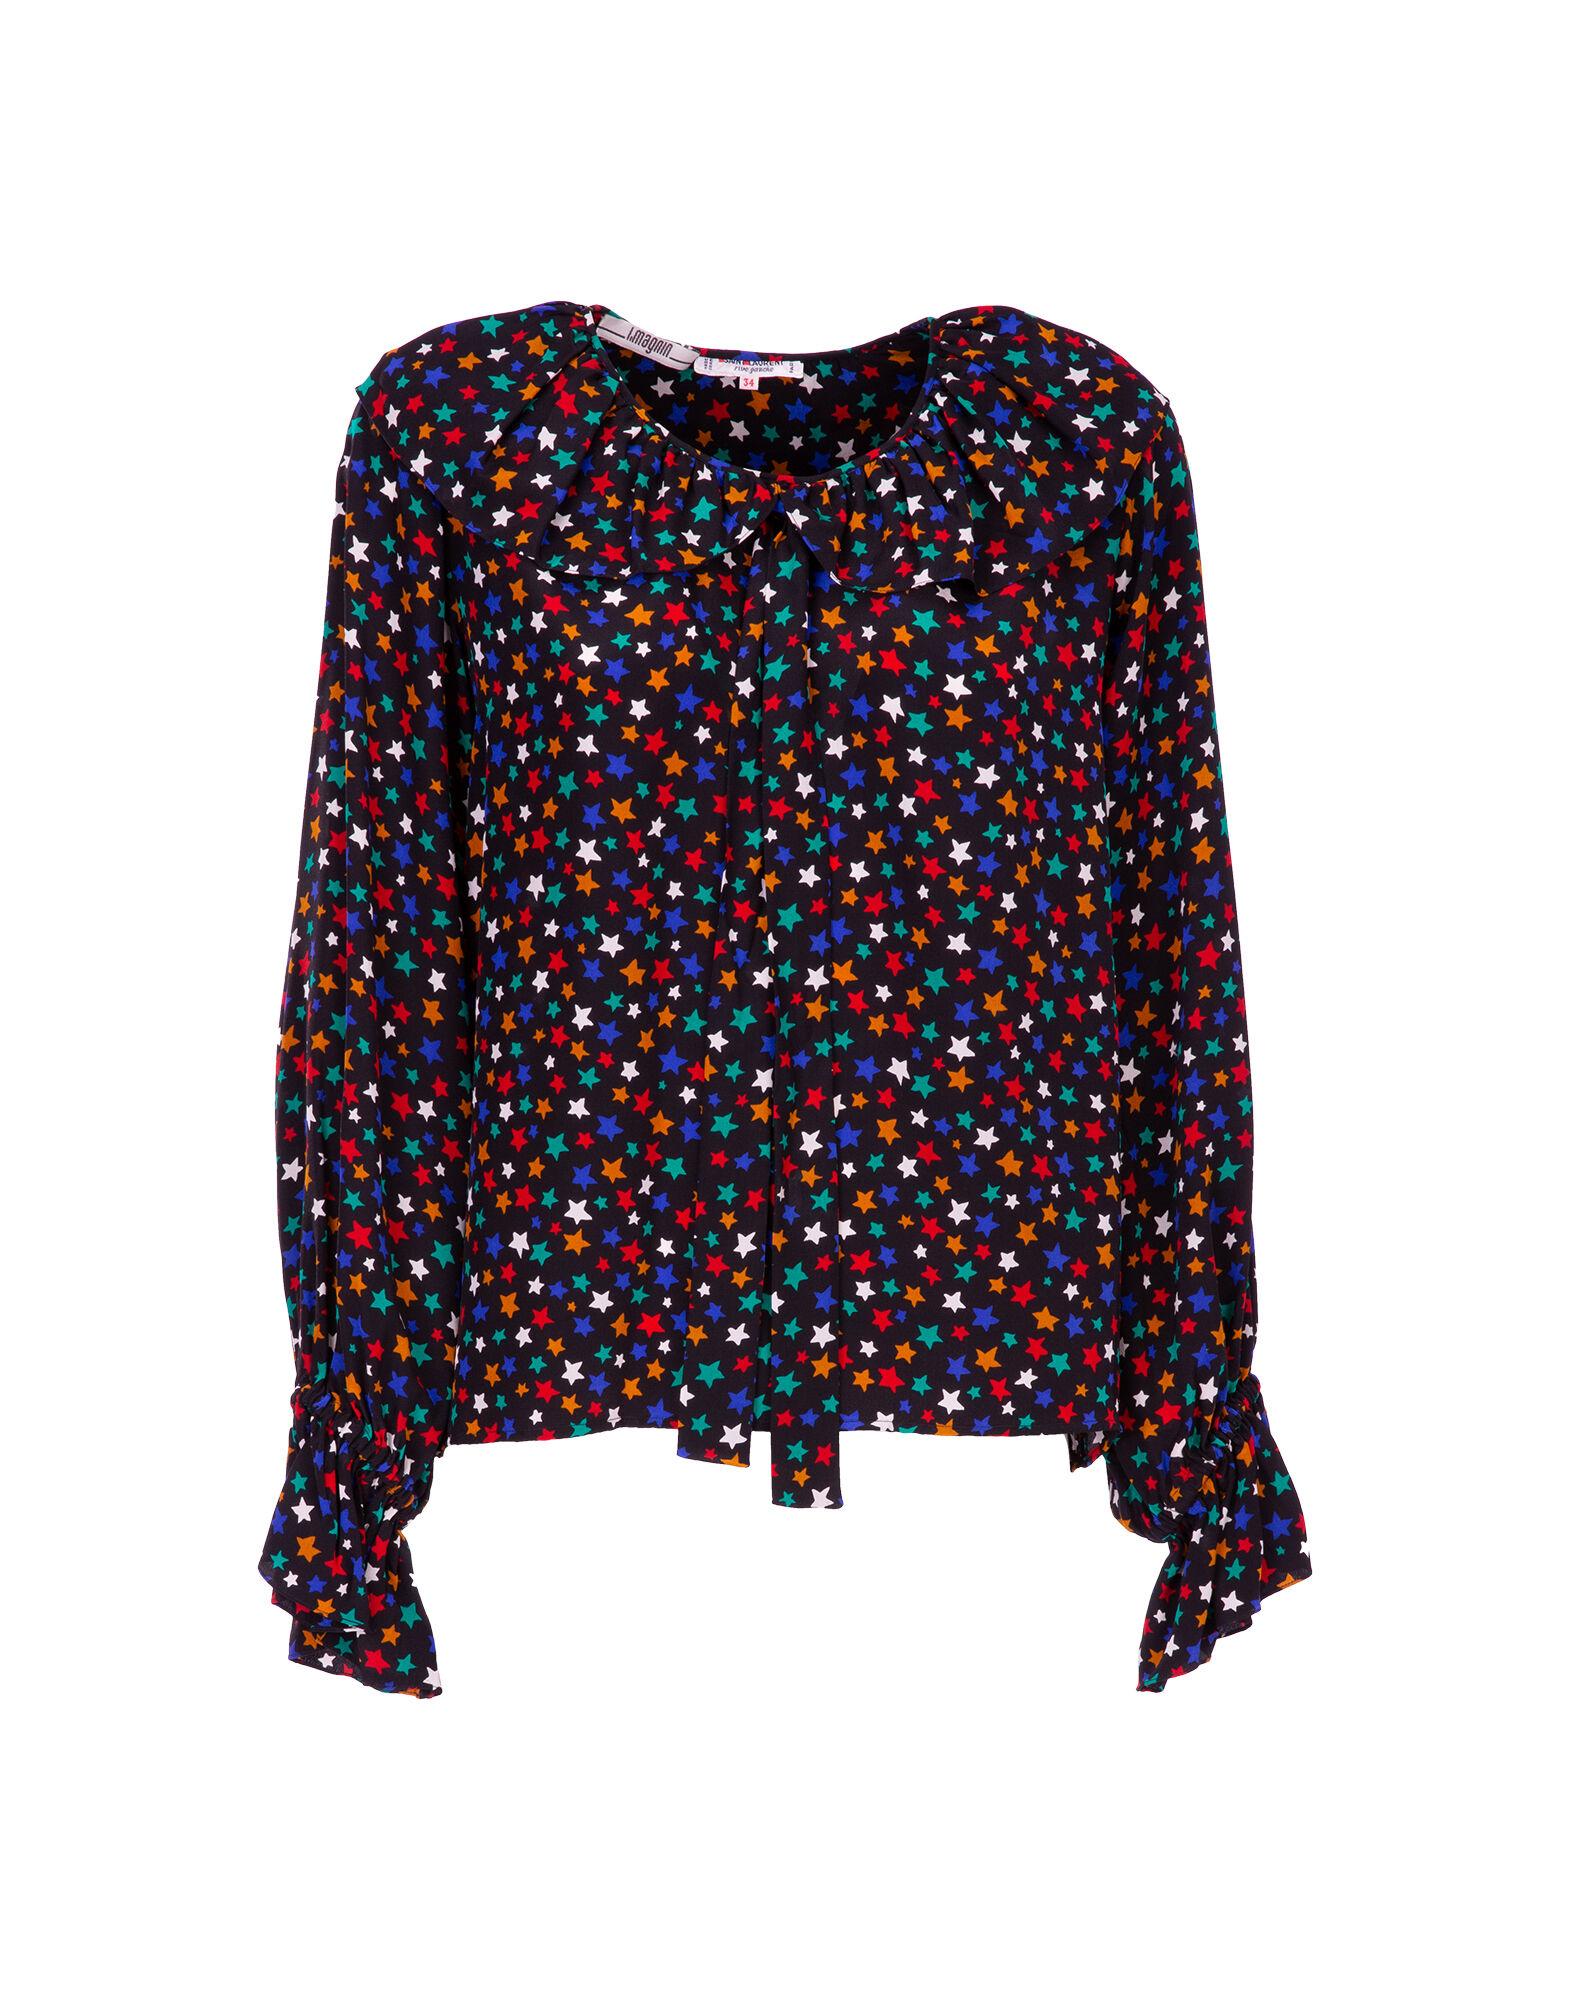 6f6e3162c3 La DoubleJ Vintage Clothing - Shirts and Tops | La DoubleJ - Yves ...